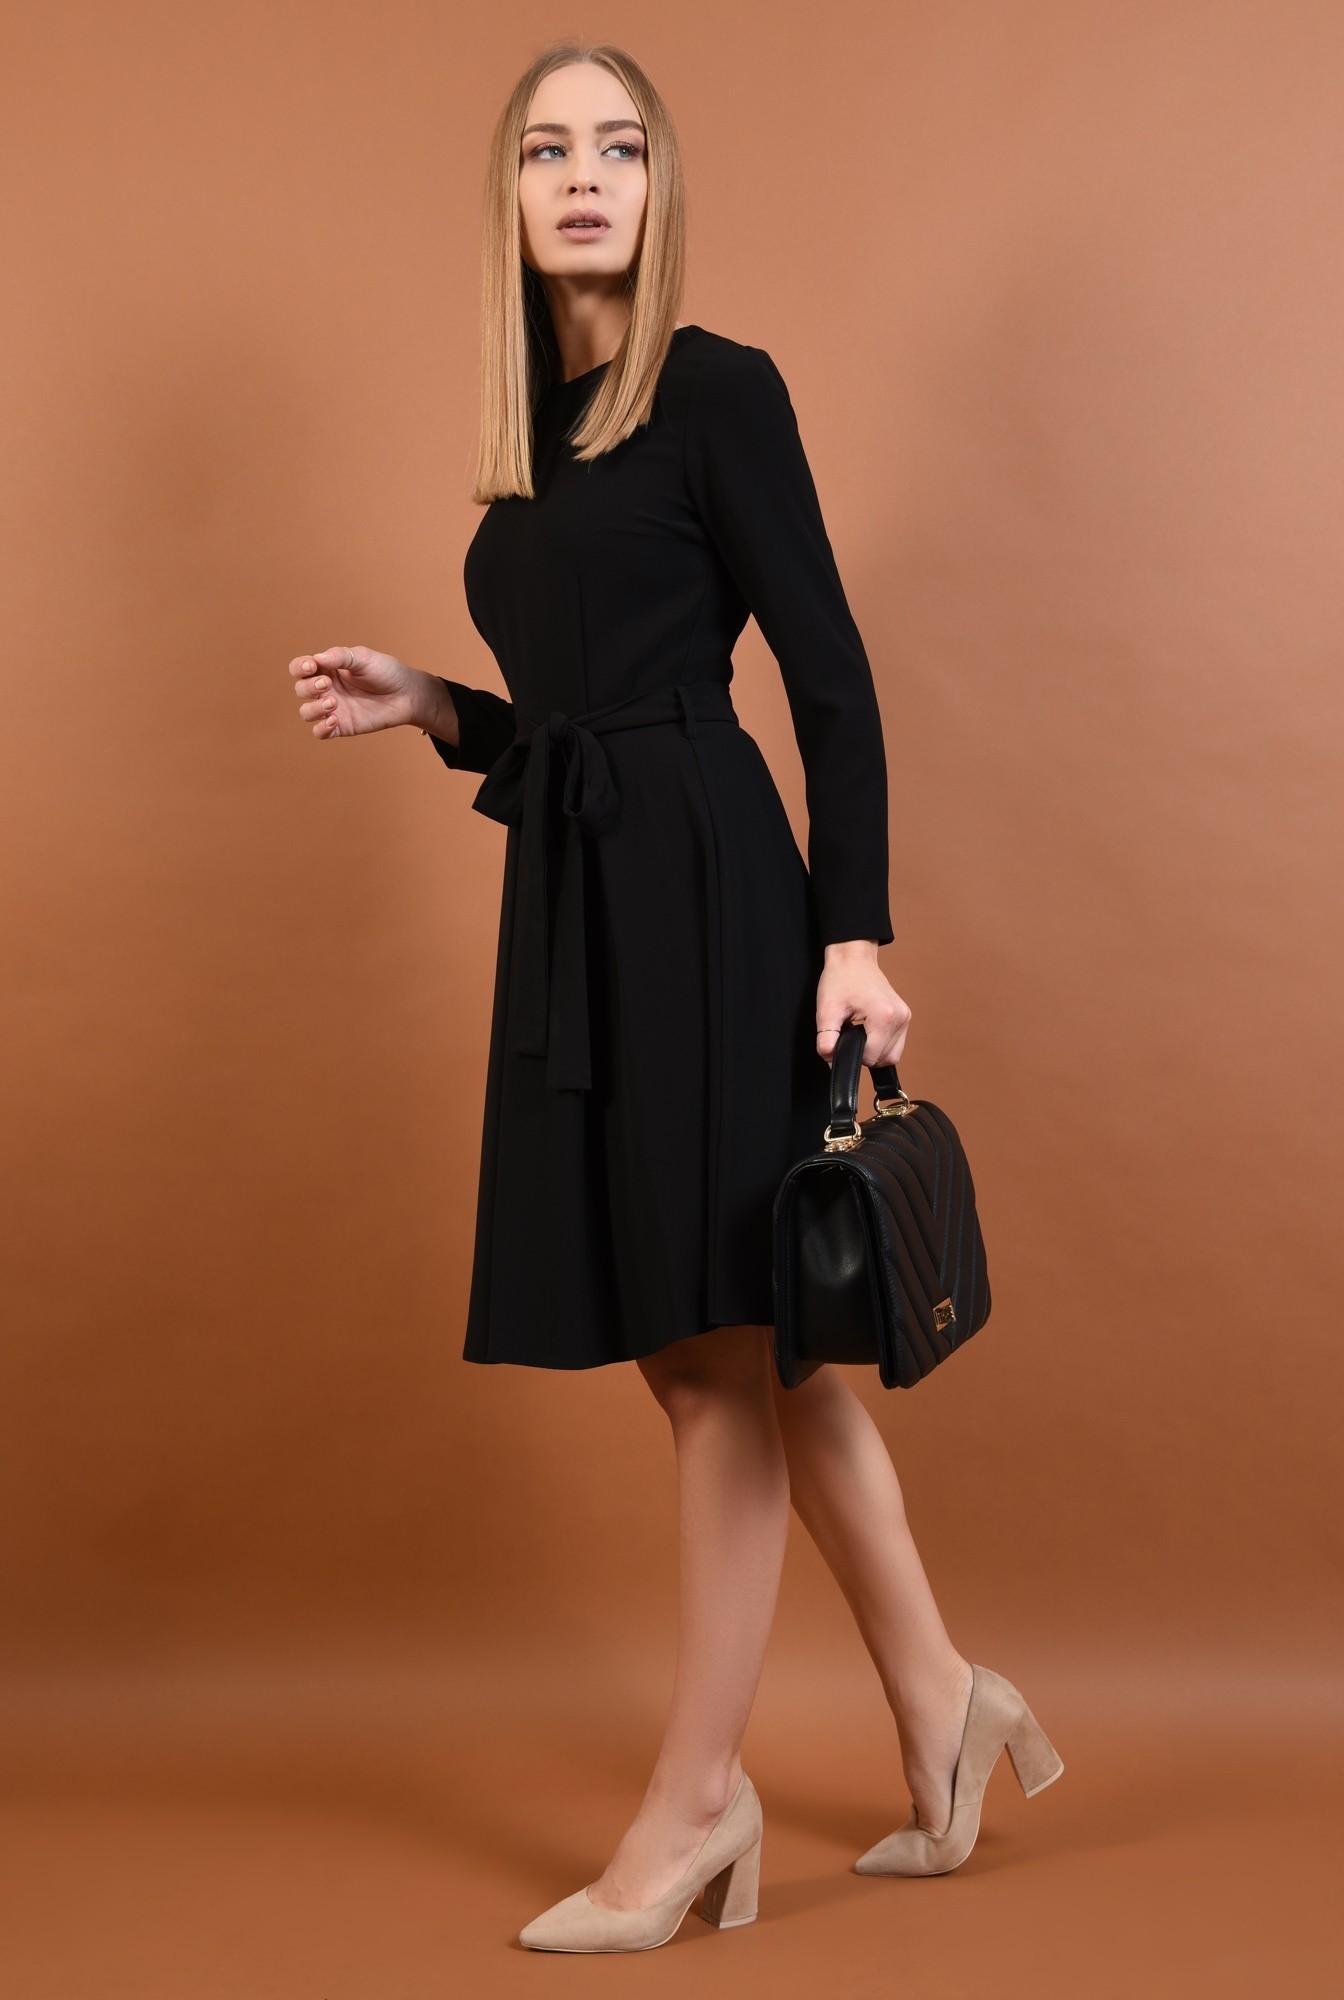 3 - 360 - rochie casual evazata, pliseuri late, cordon, funda, negru